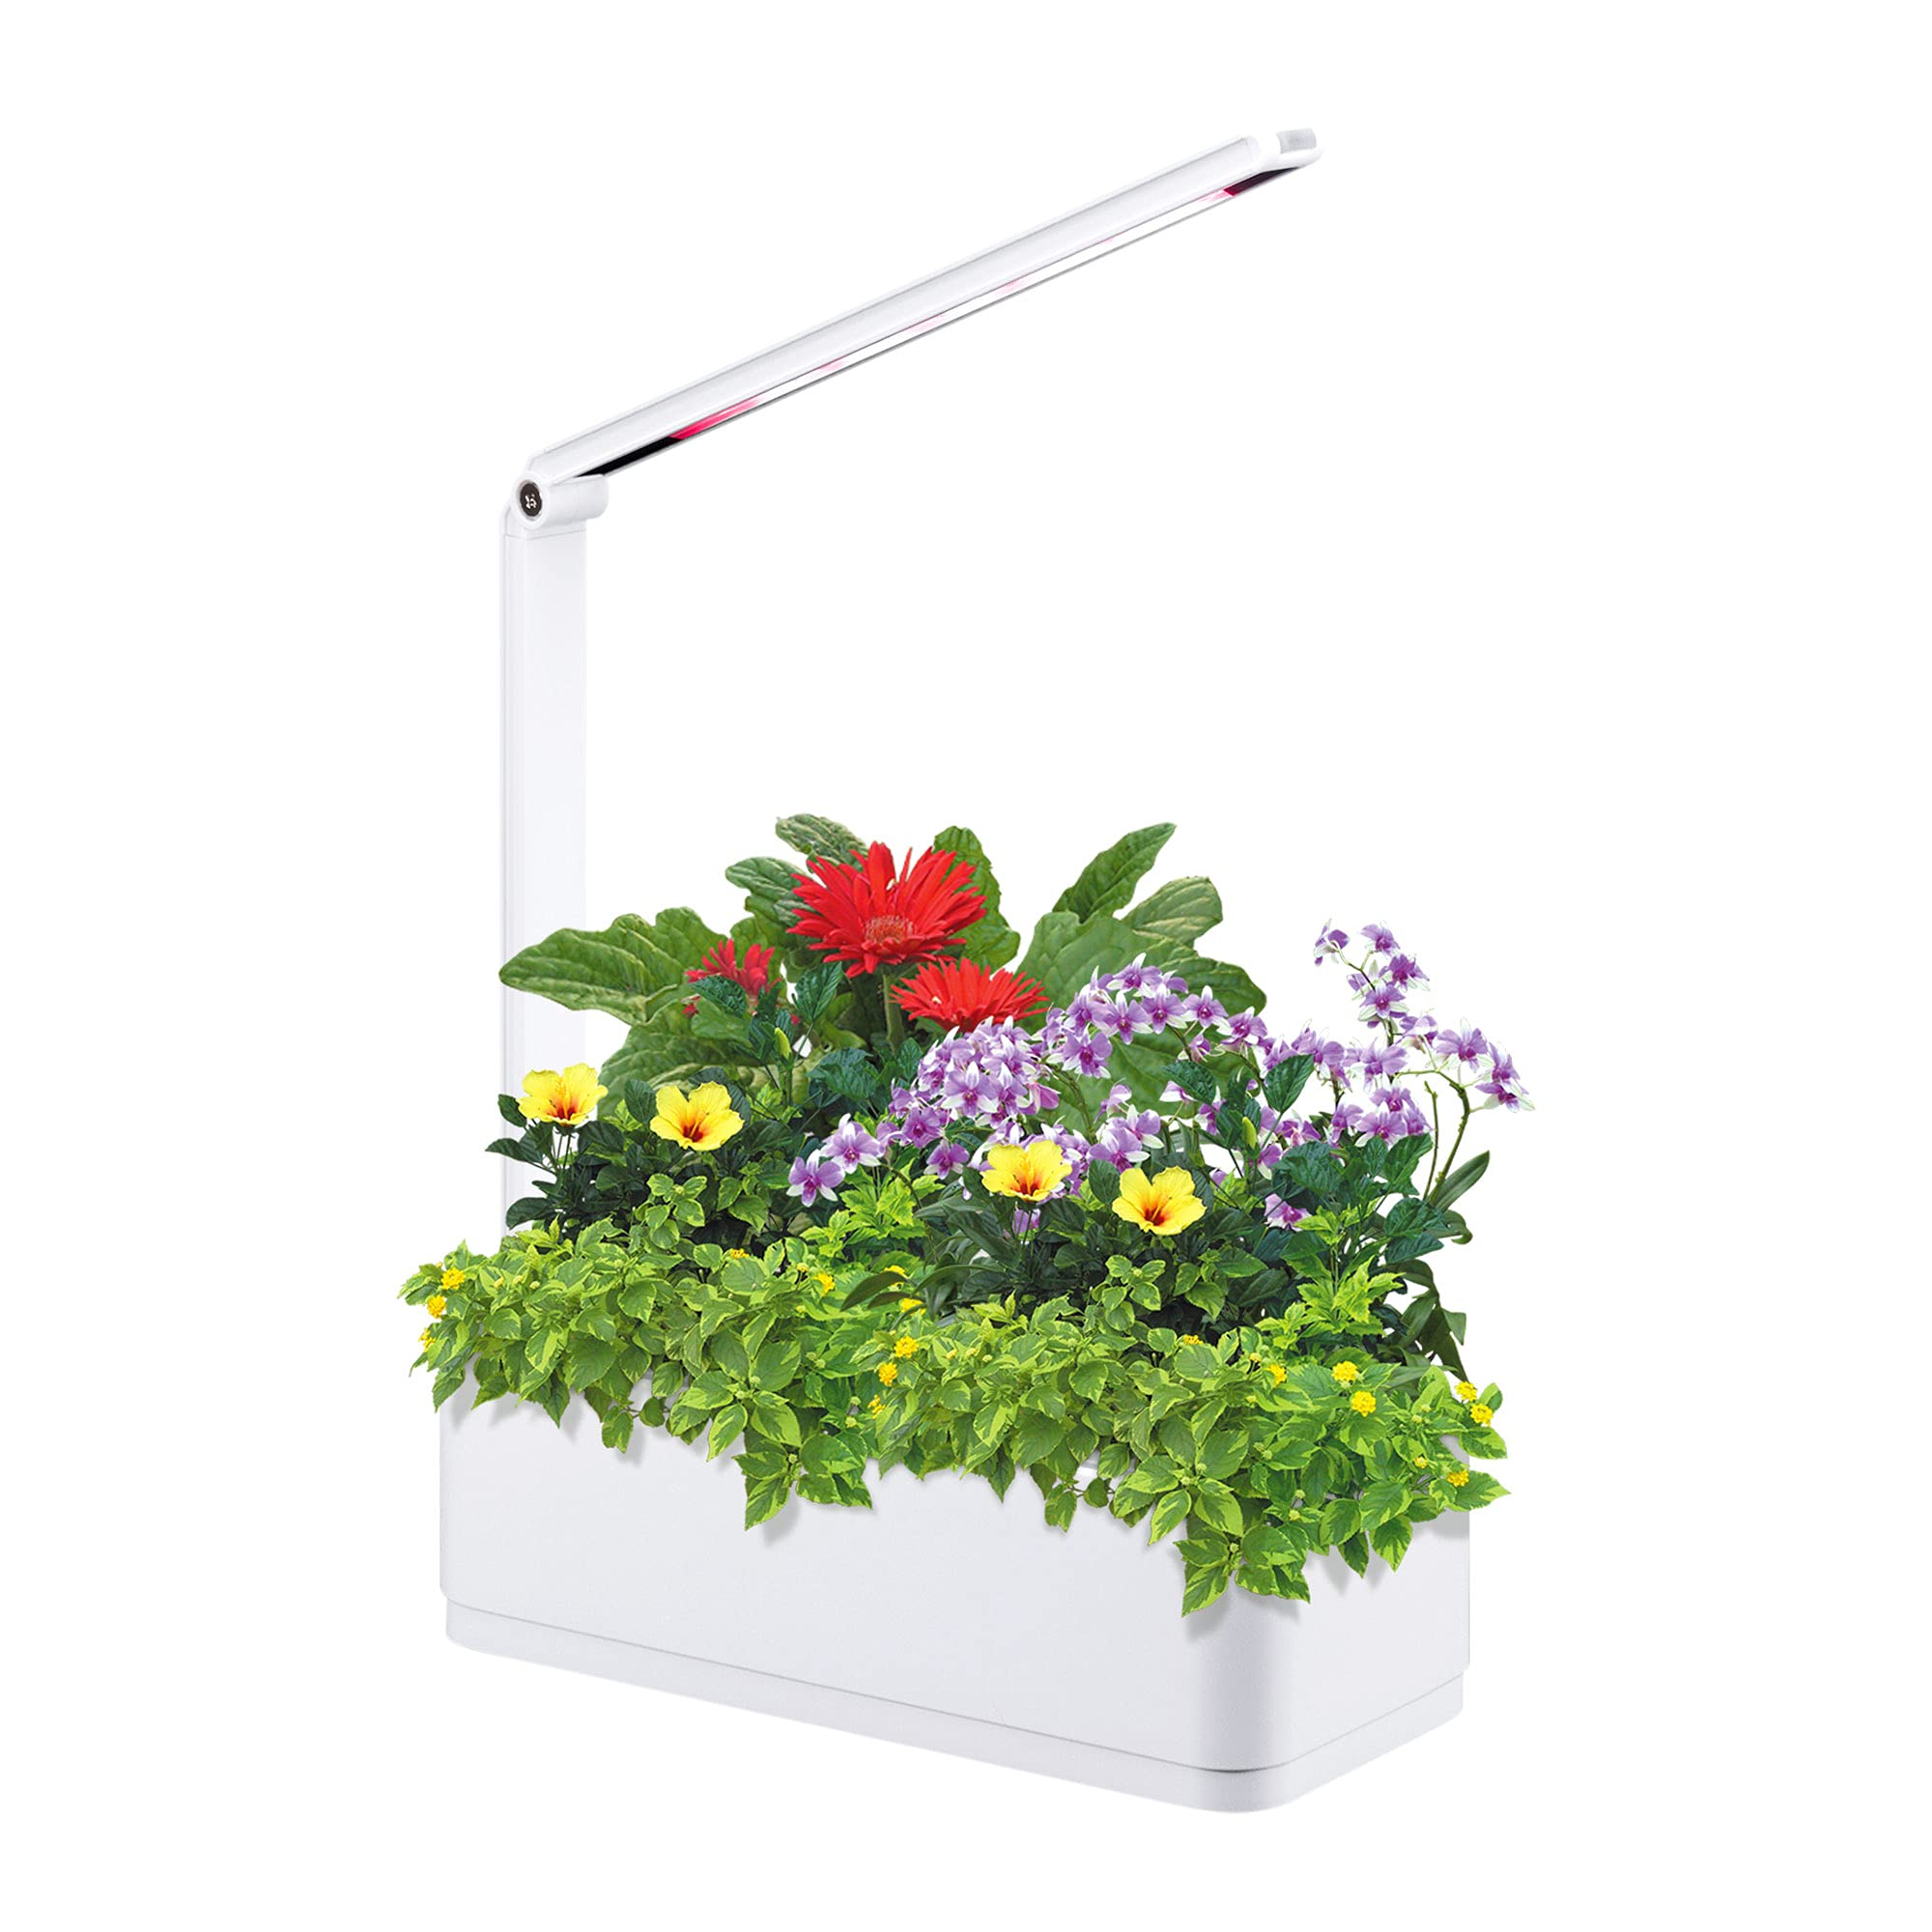 Scottish boy Intelligent Hydroponics Growing System Kit, Indoor Herb Garden with Grow Light Hydroponic Herb Garden